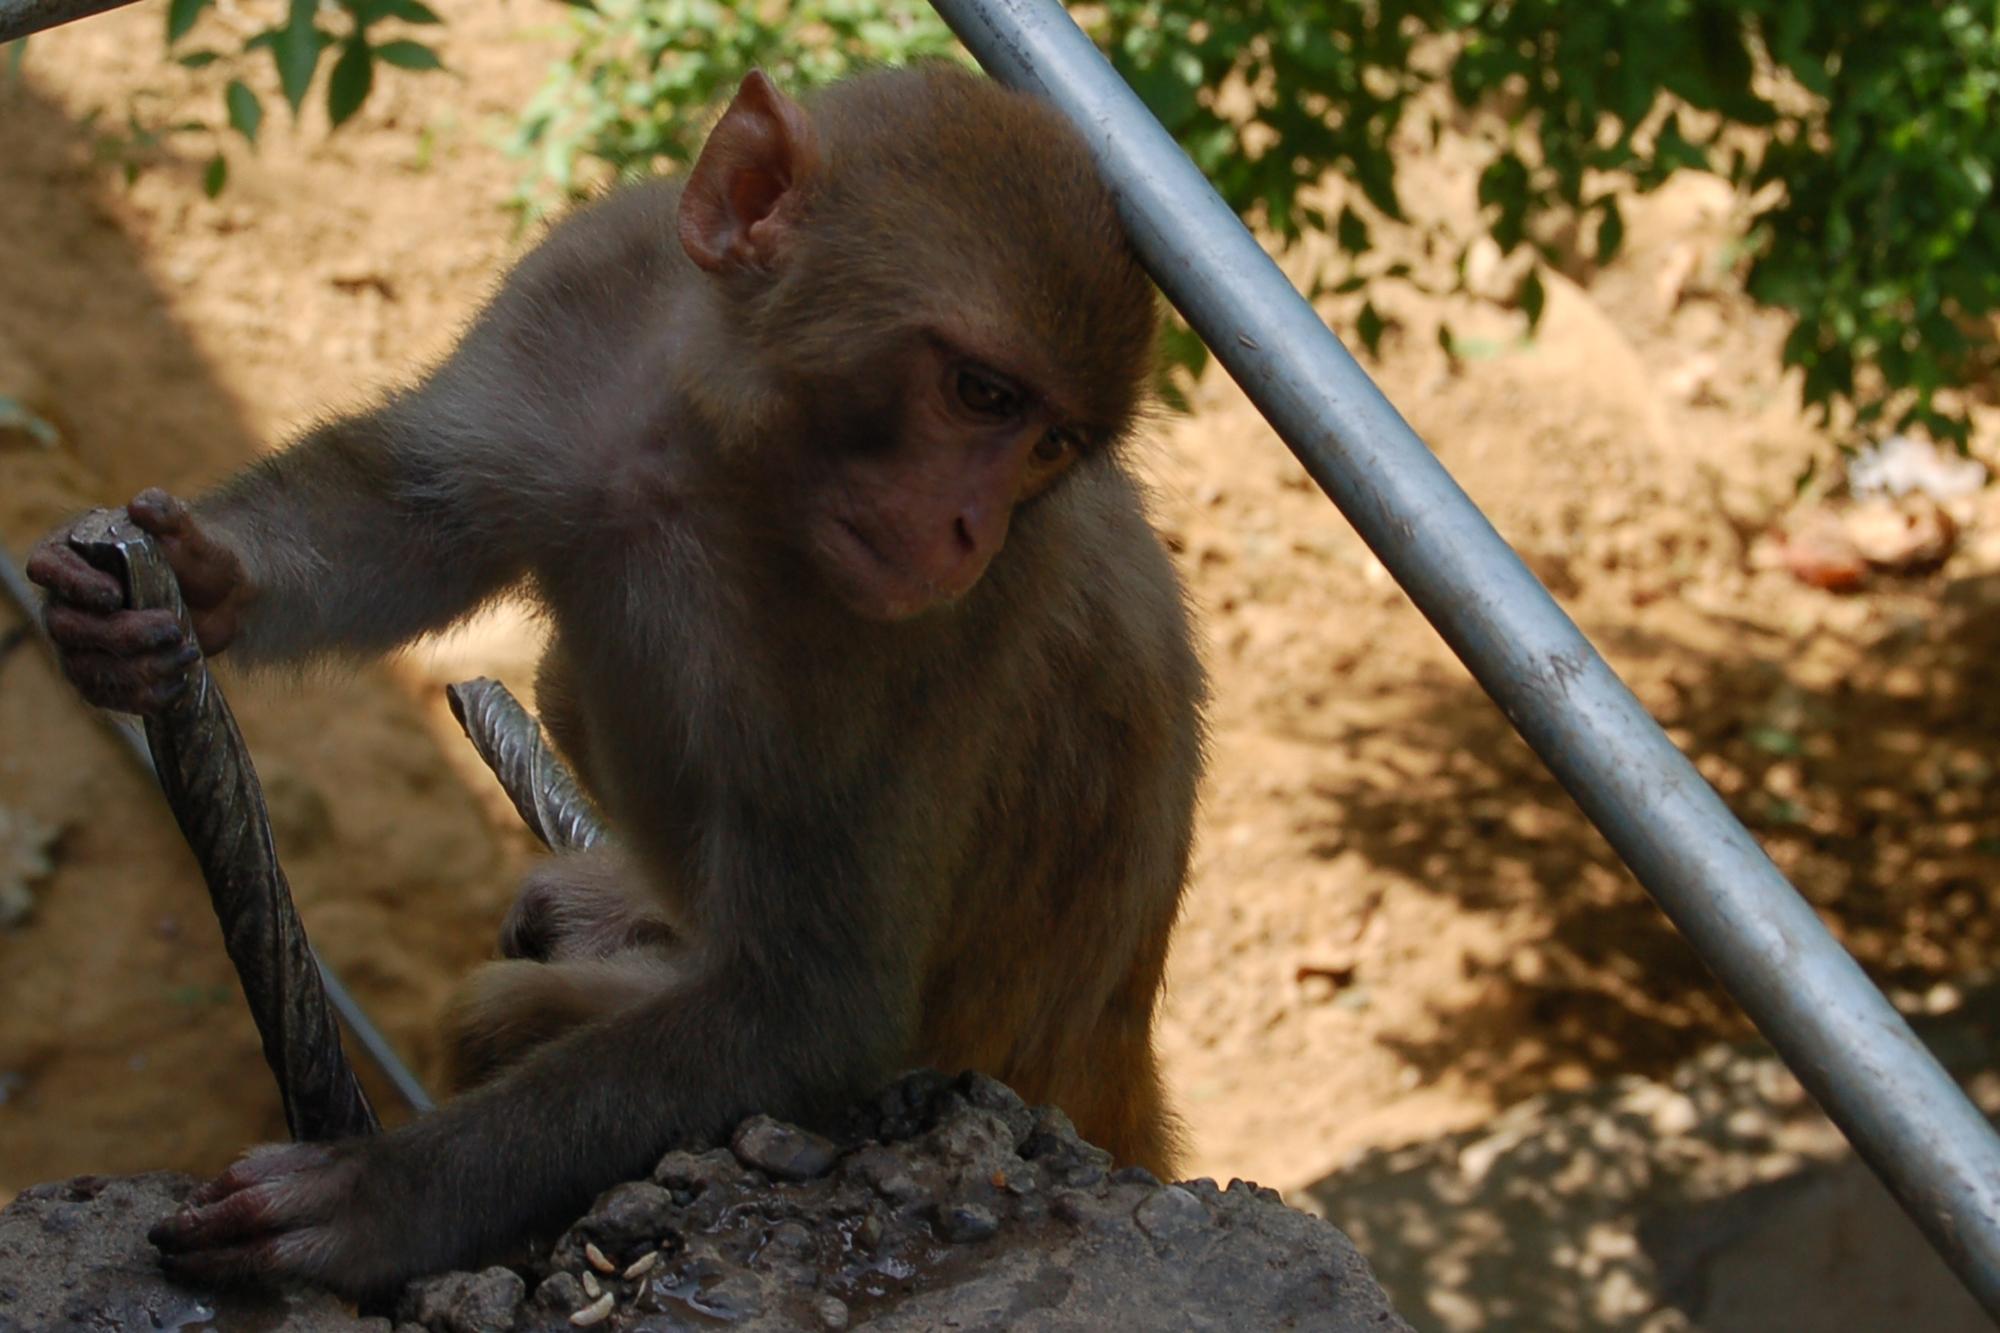 Monkey, Animal, Ape, Bars, Bspo06, HQ Photo